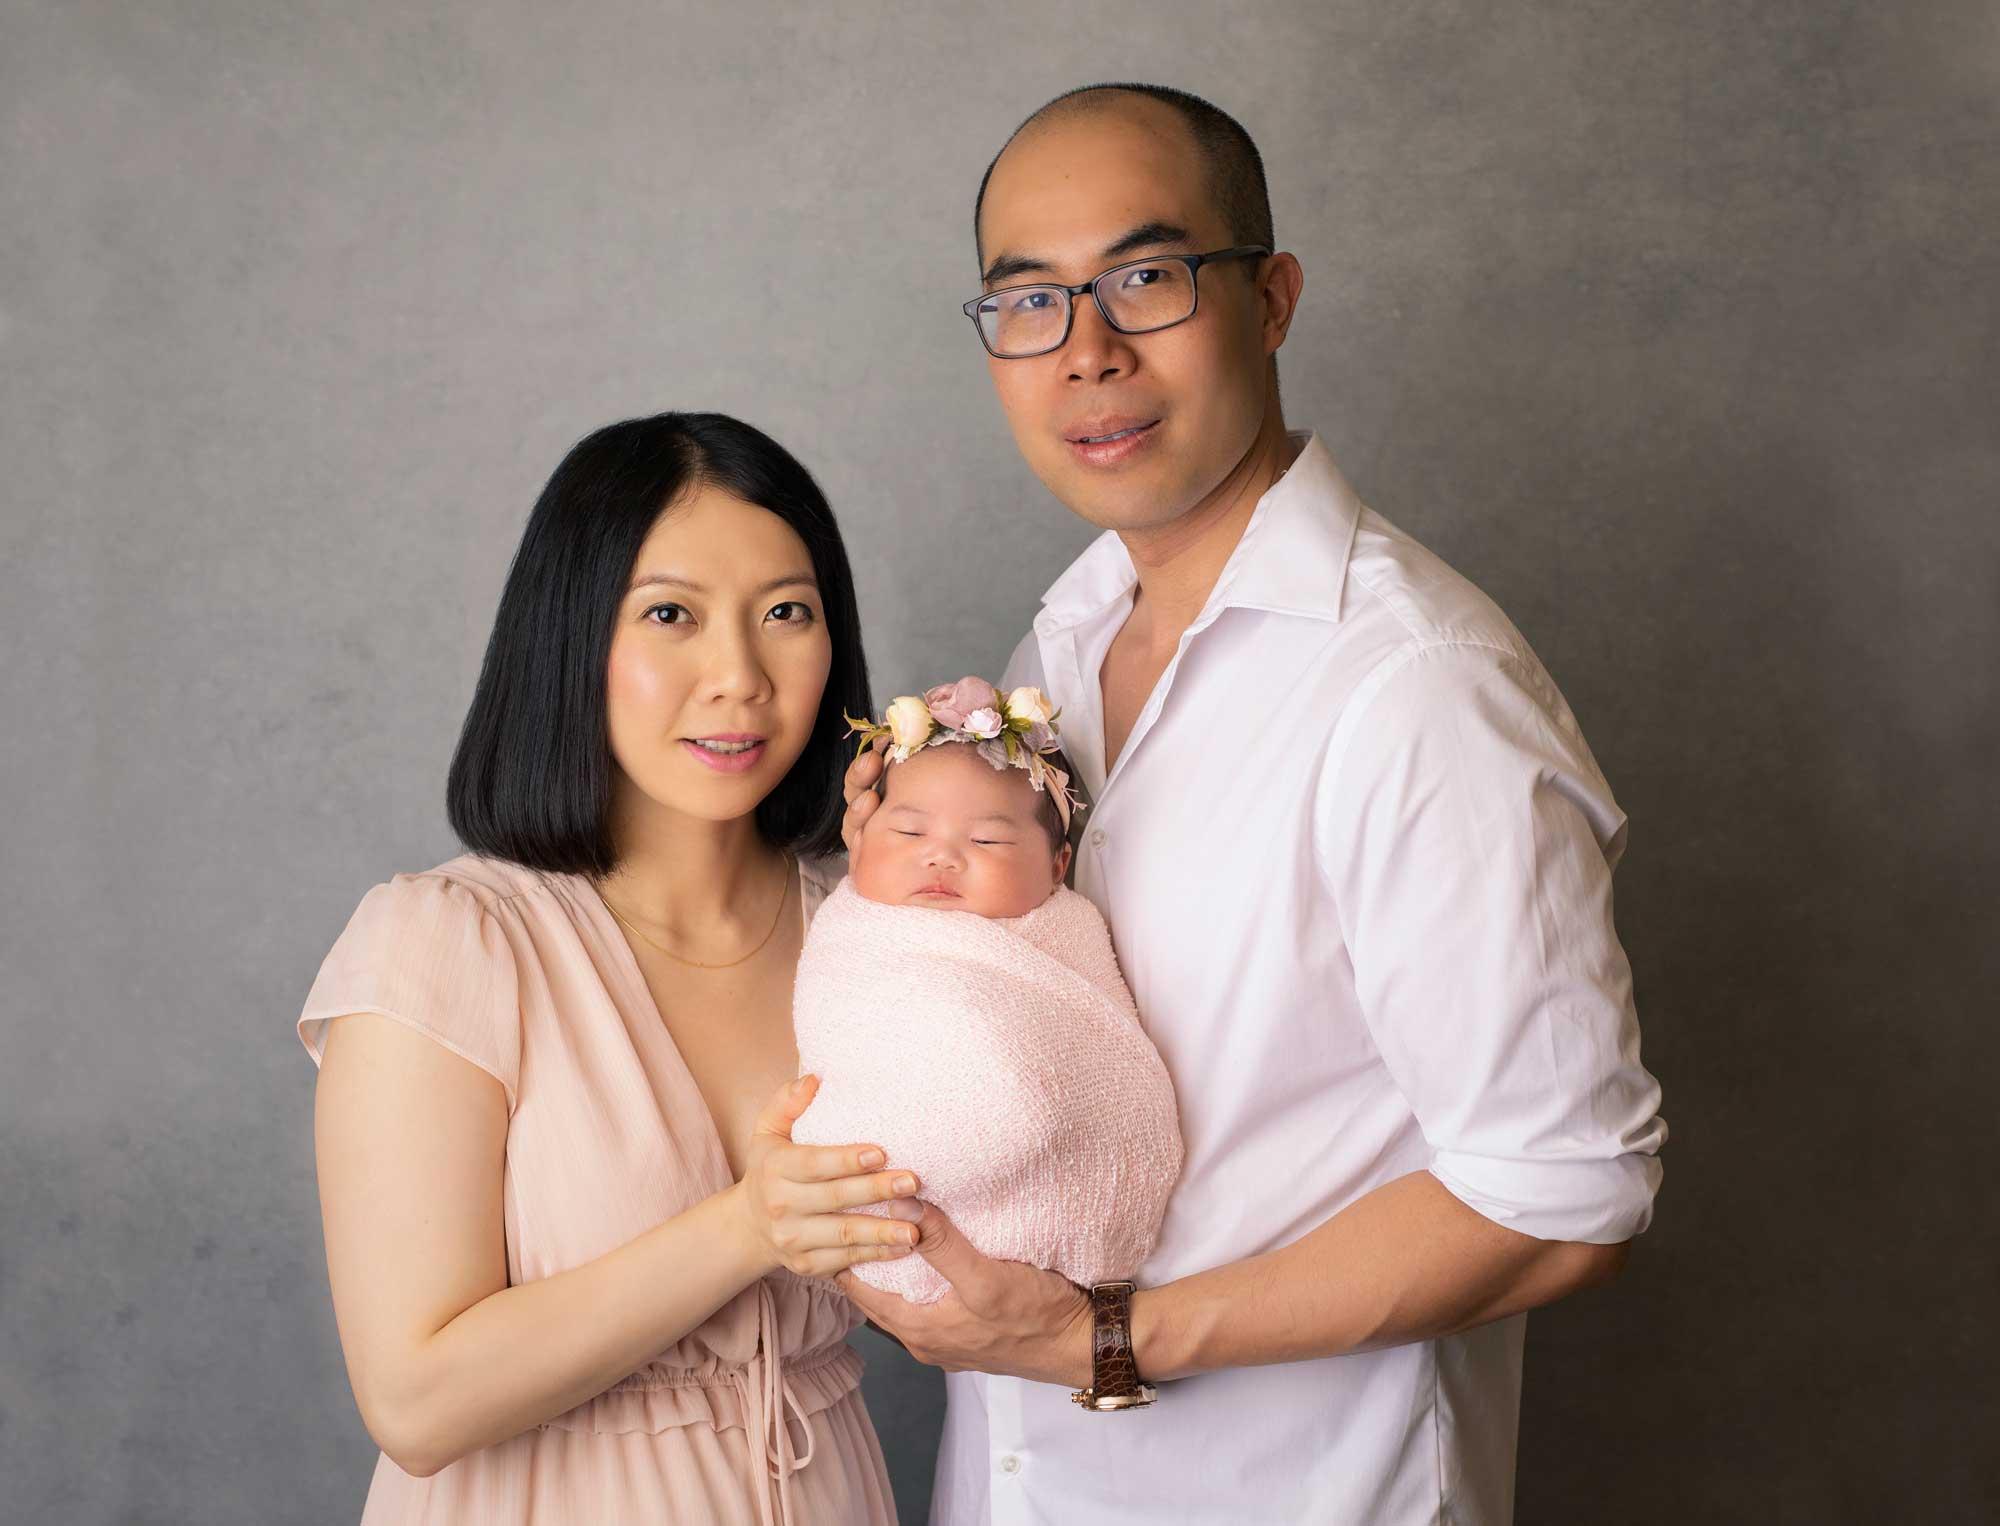 newborn photography in Chicago